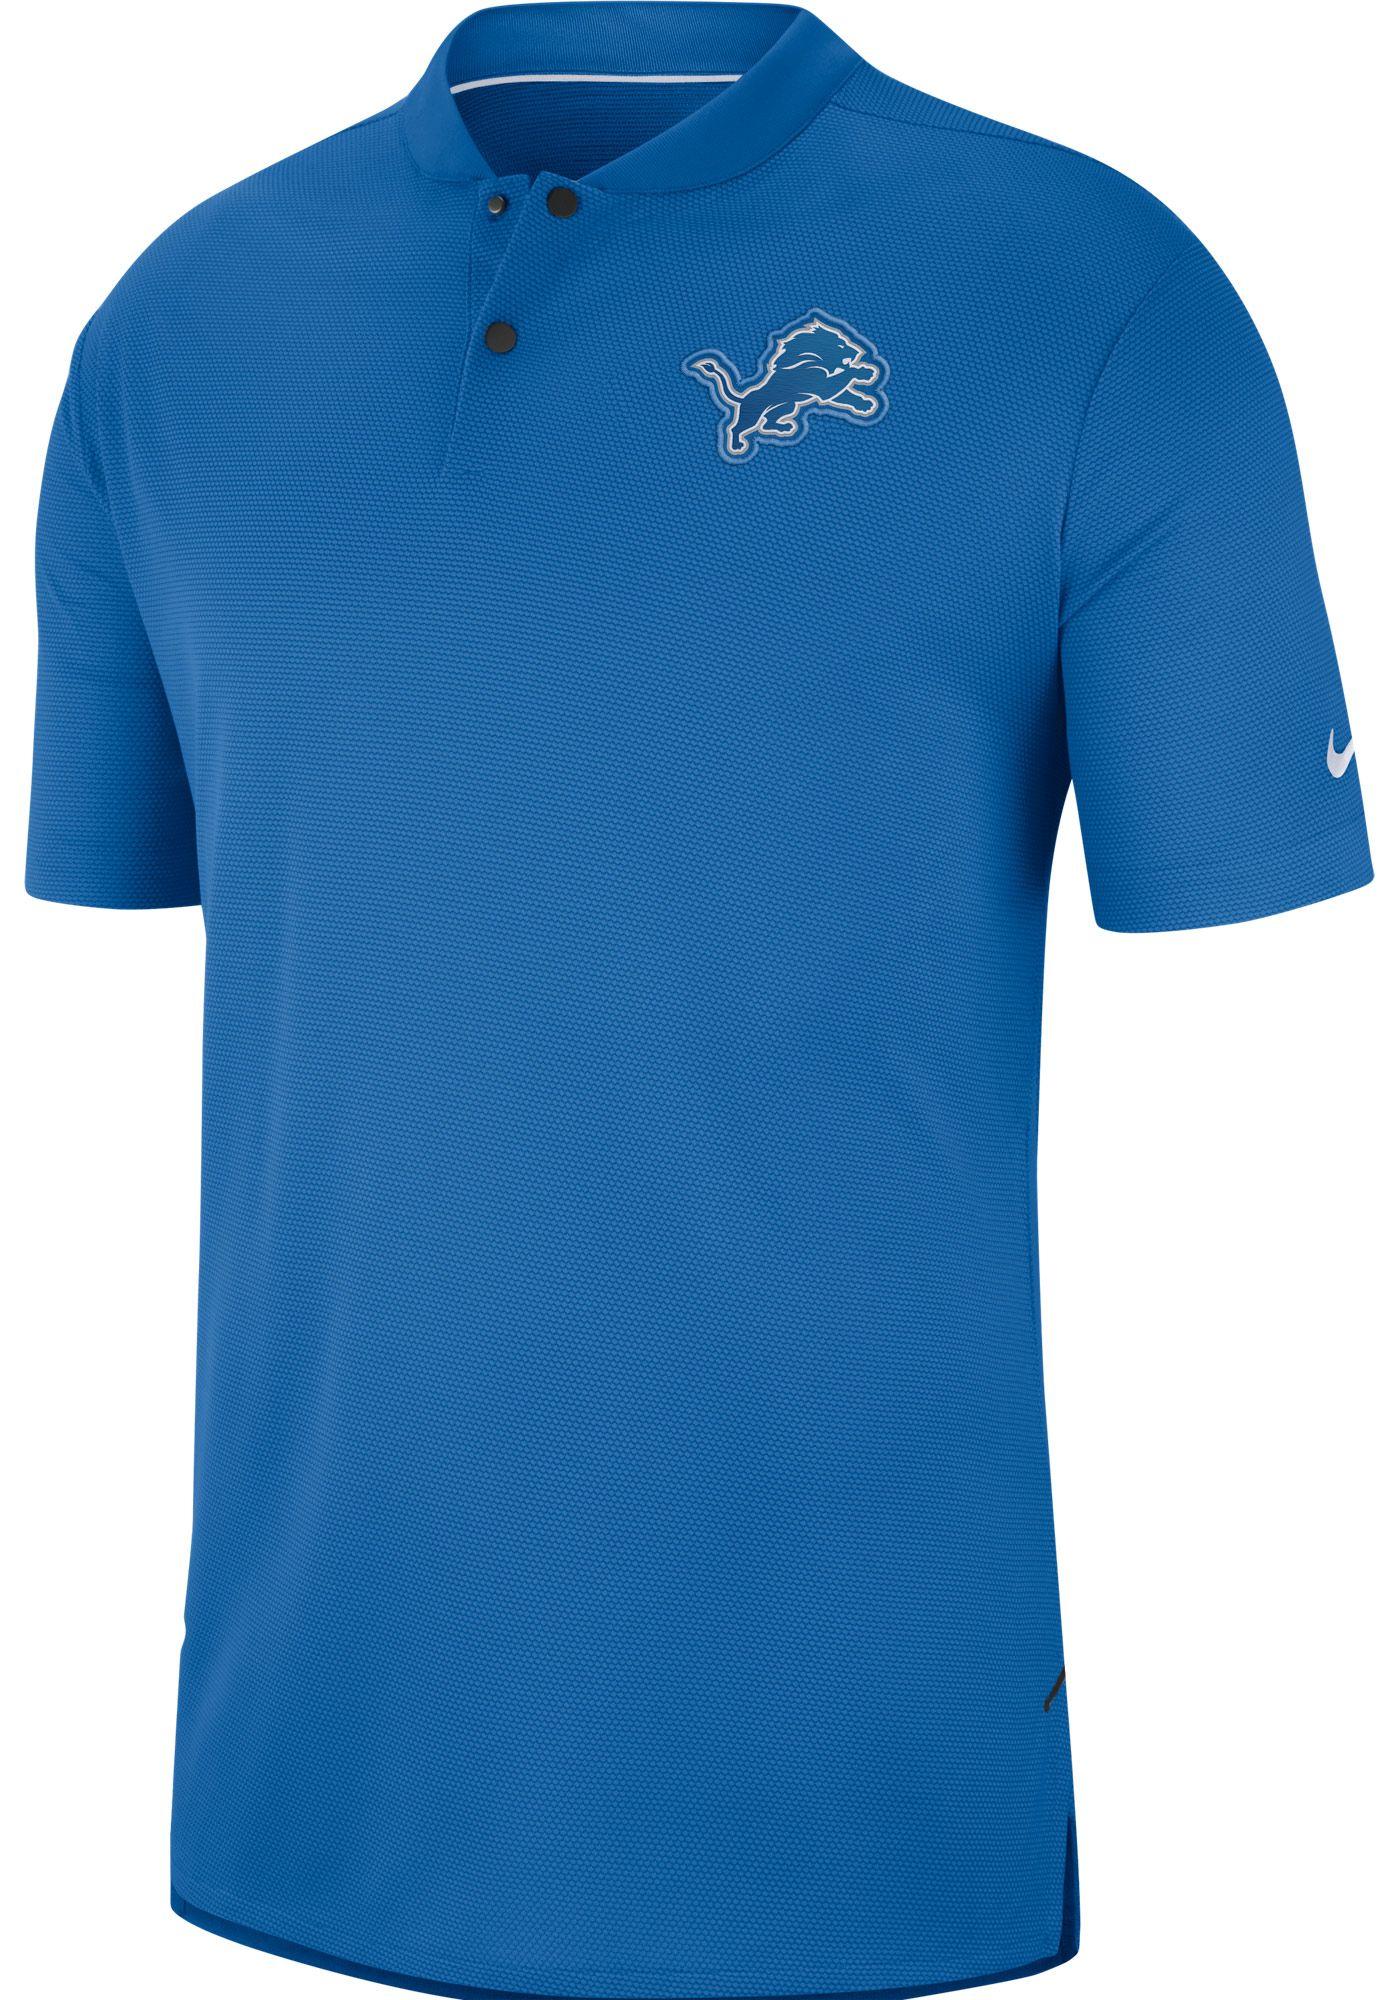 Nike Men's Detroit Lions Sideline Elite Performance Blue Polo